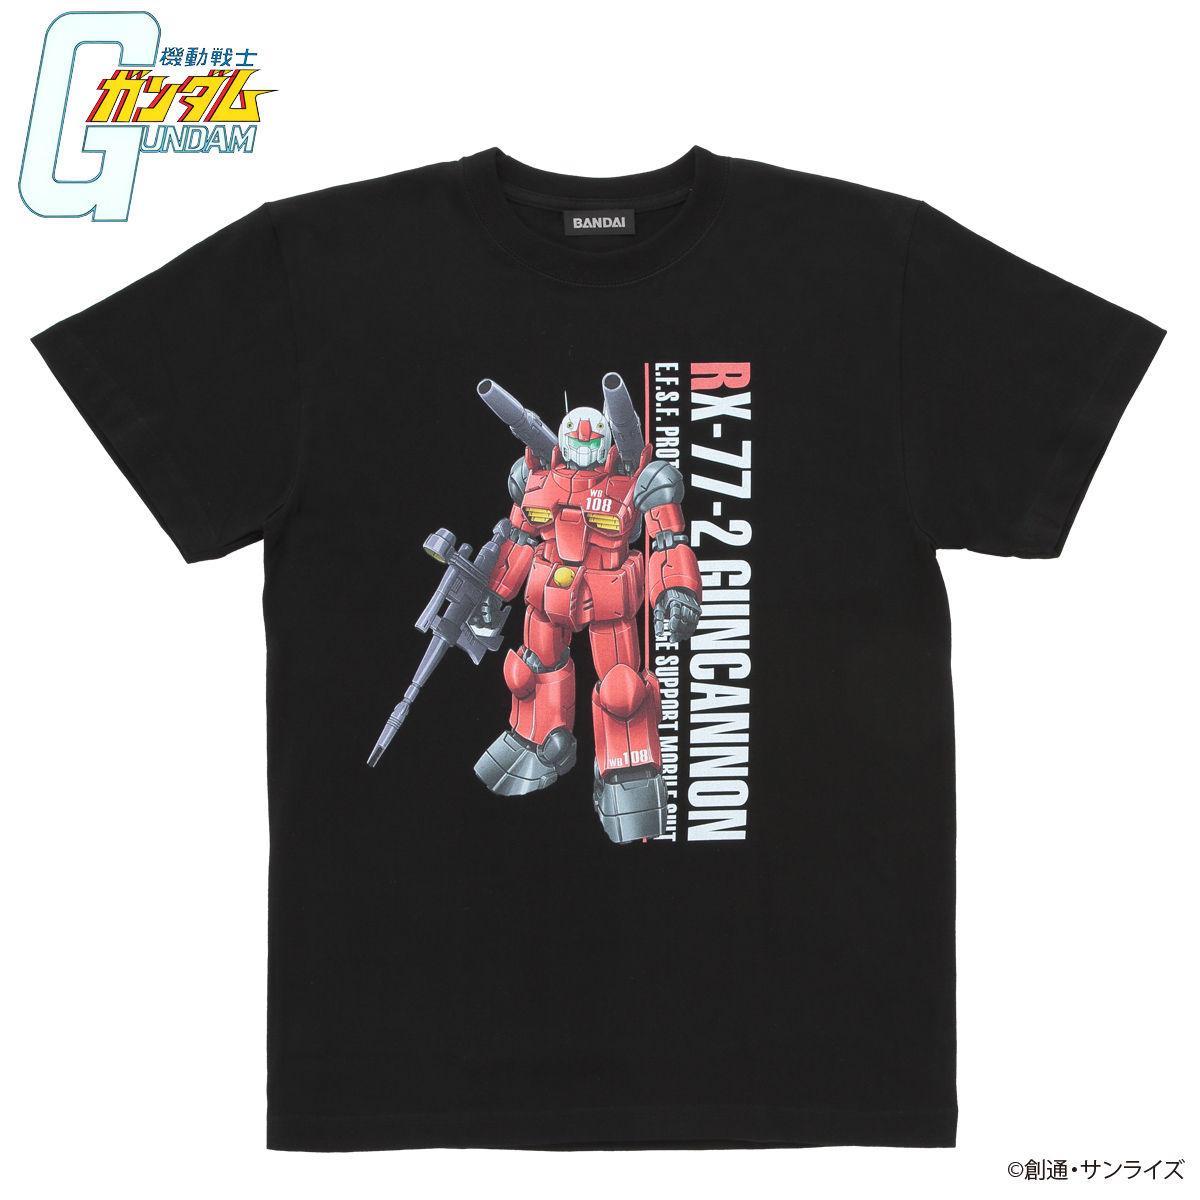 Mobile Suit Gundam Full Color T-shirt Version 2.0